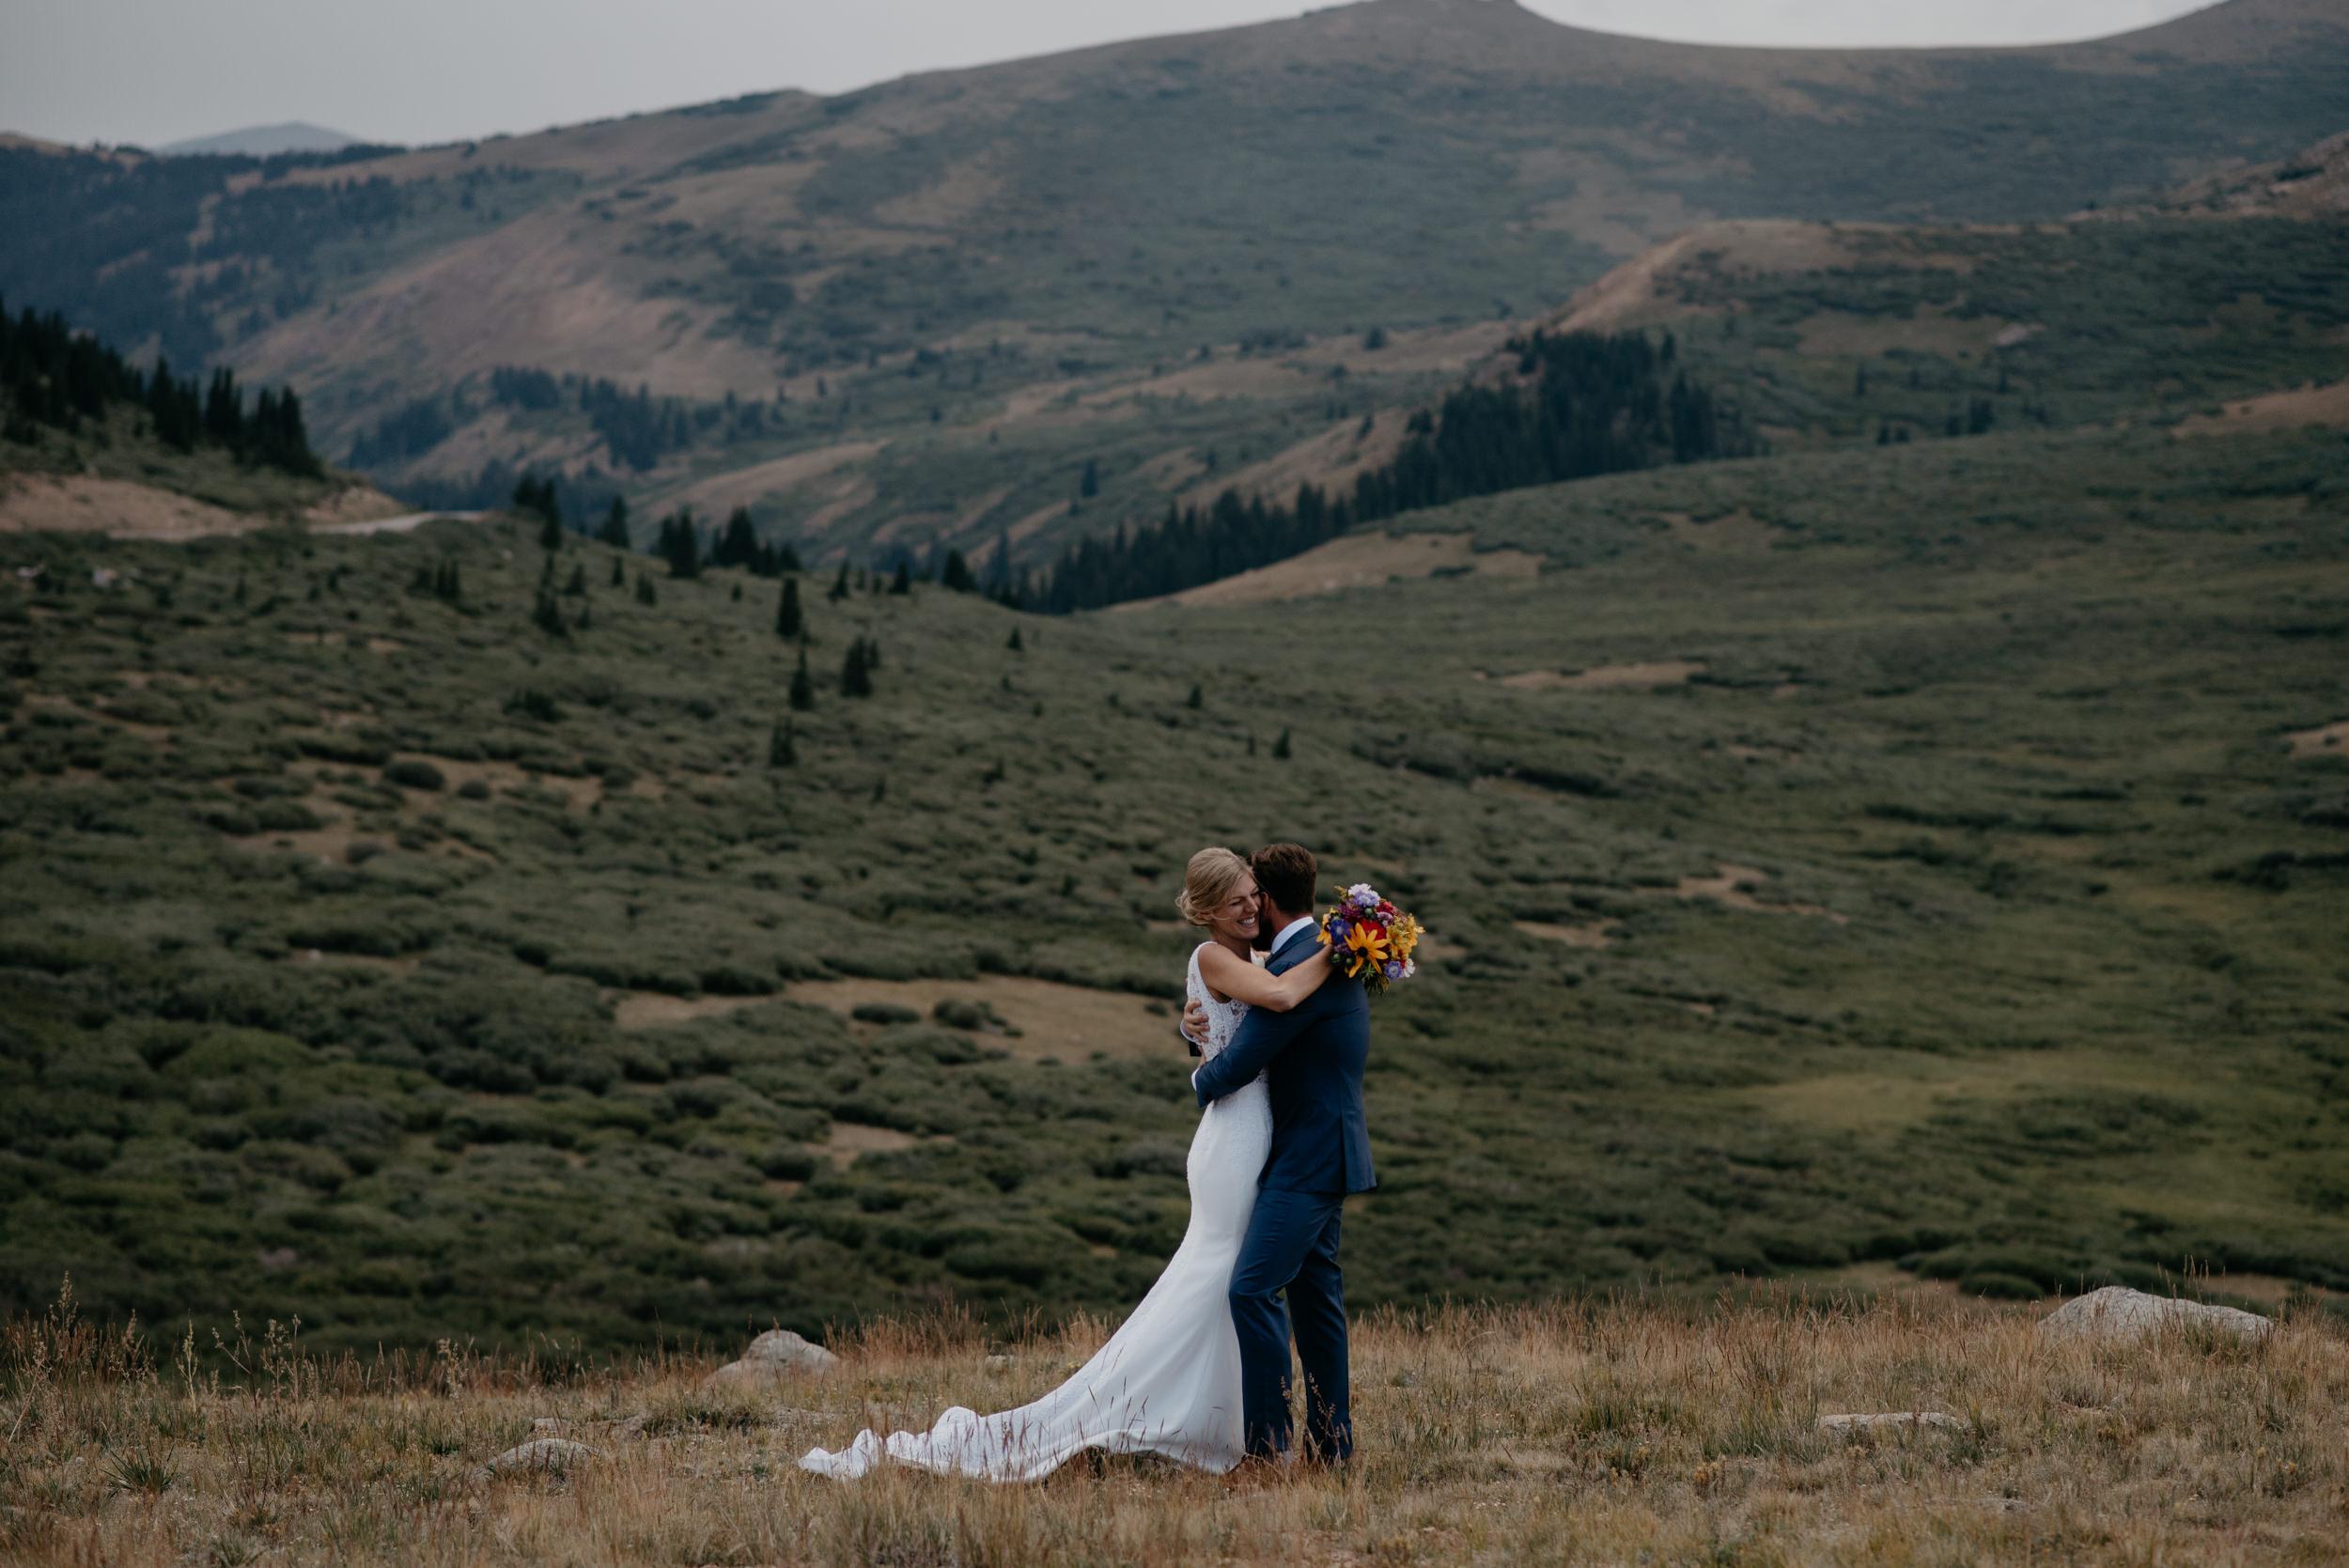 Colorado mountain elopement and wedding photography